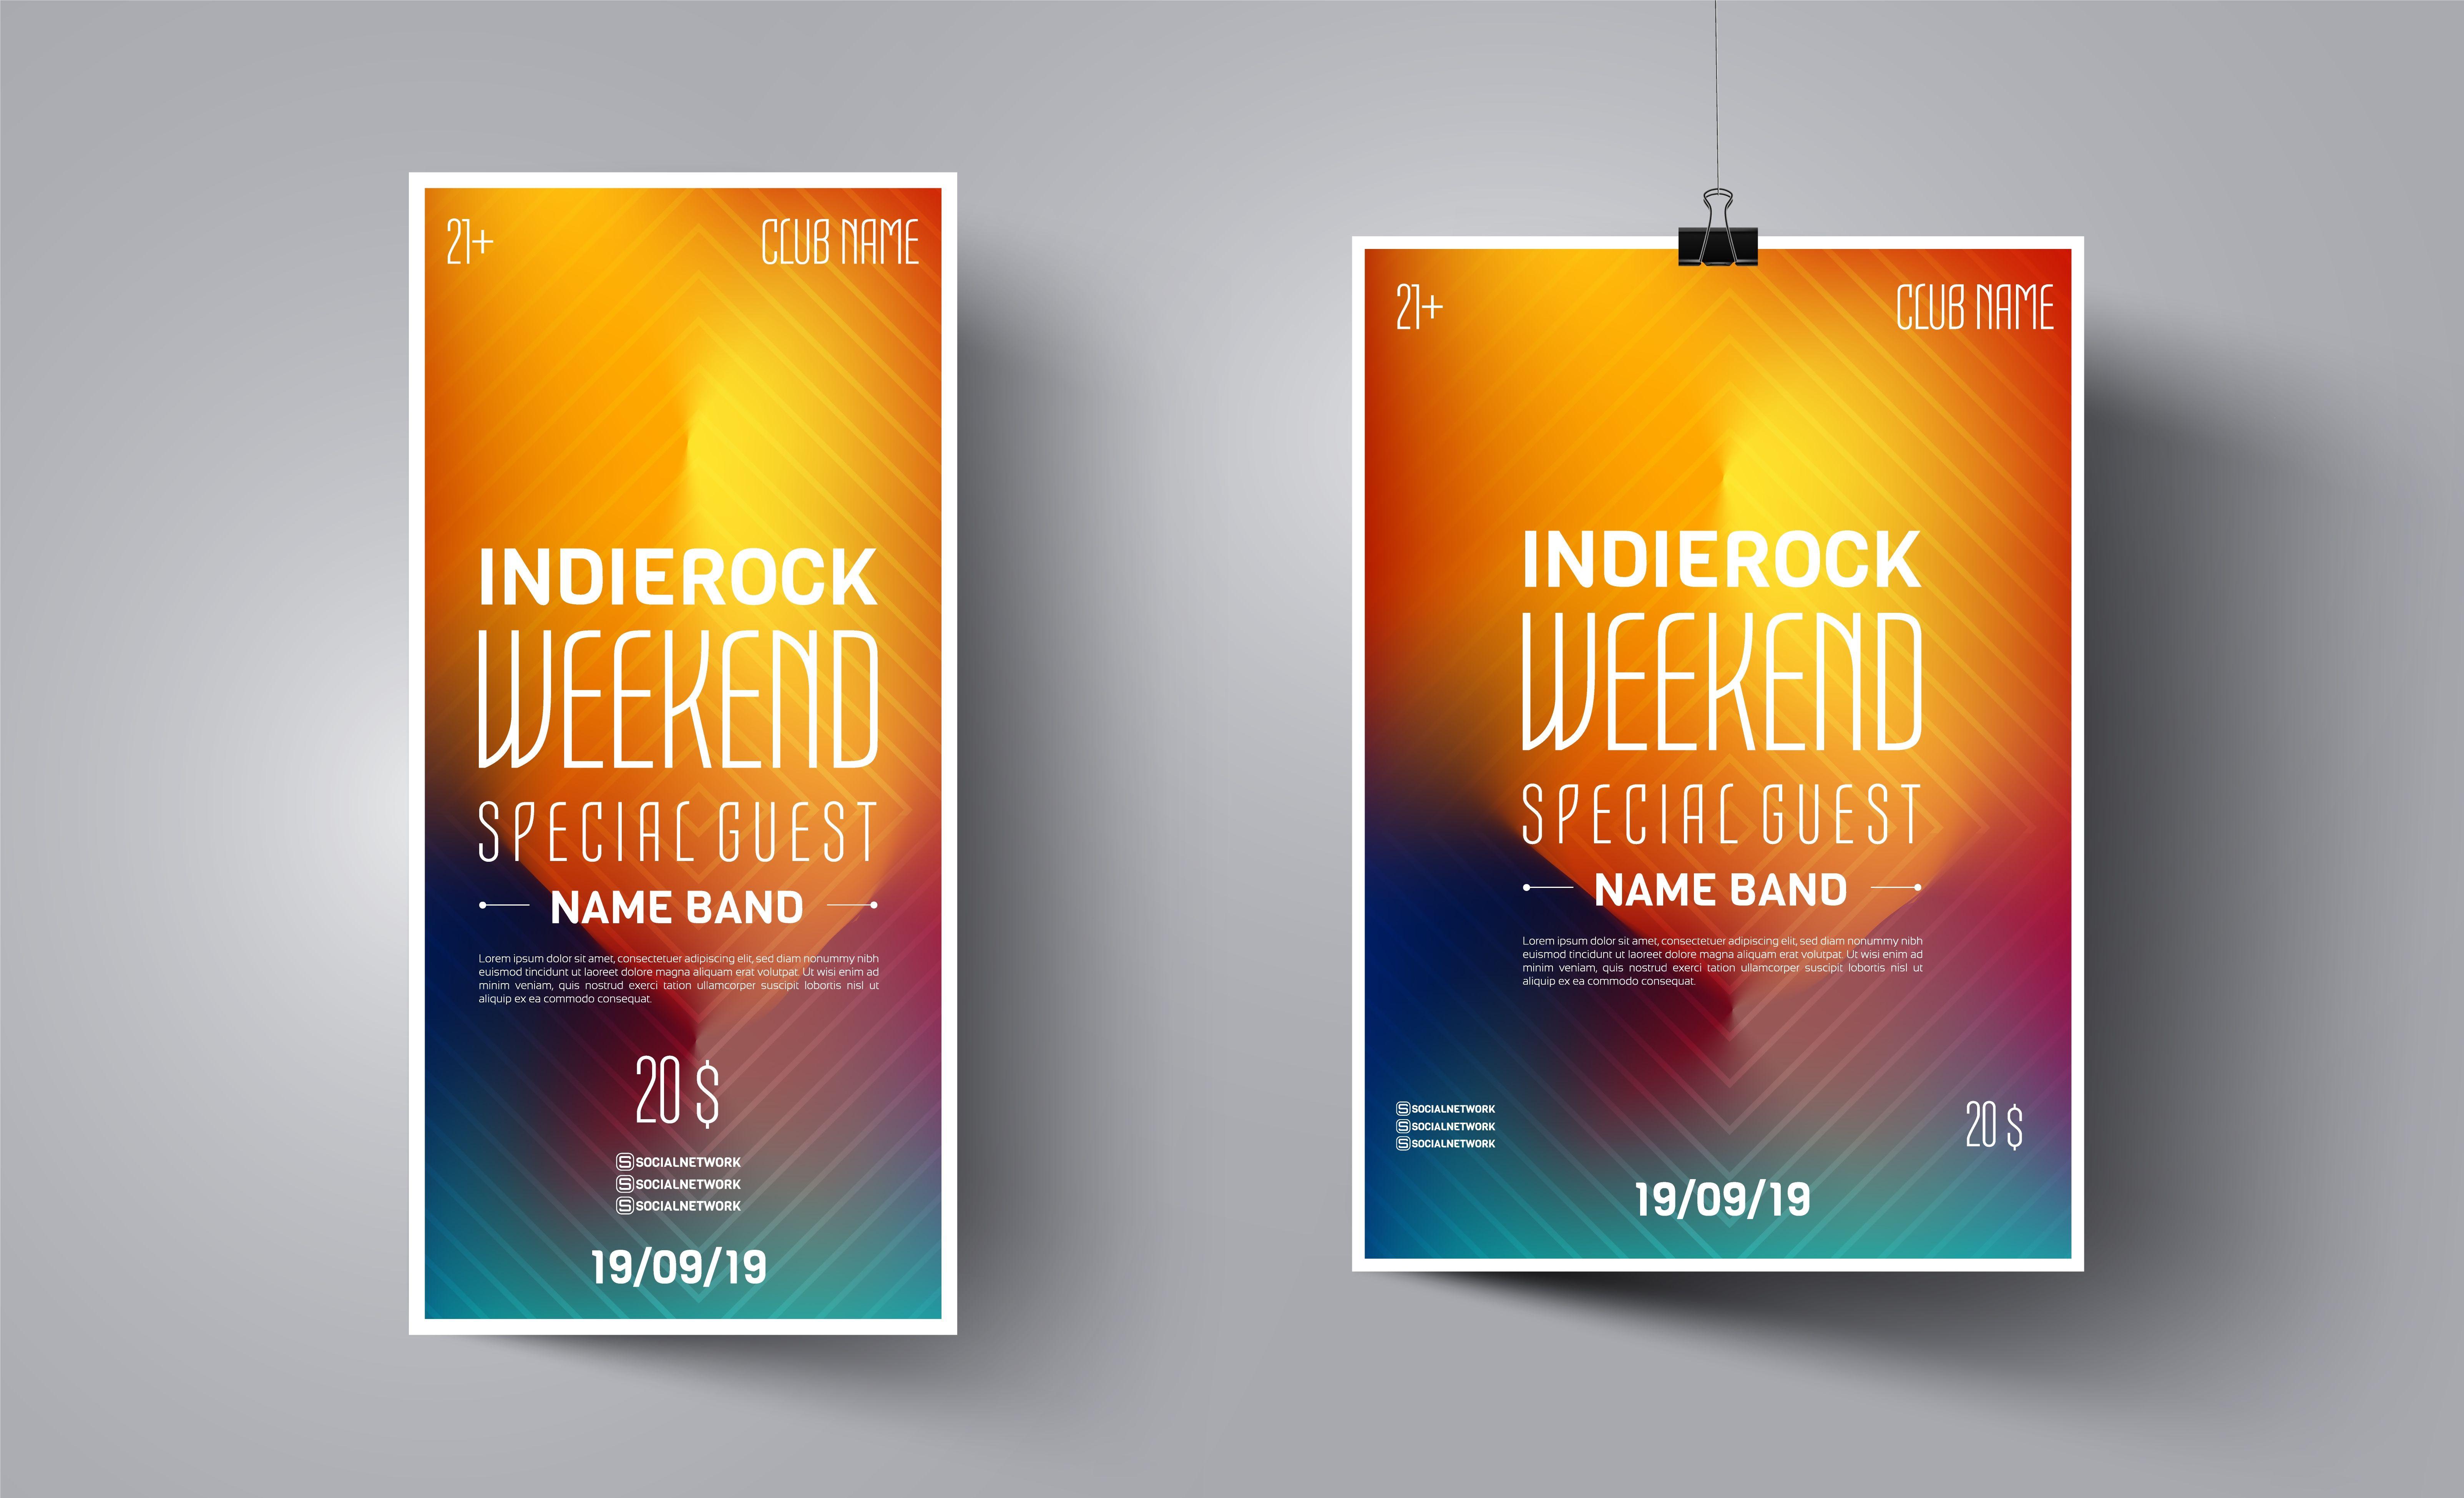 Poster Advertising Design Vector Illustration Club Dj Poster Music Dance Event Advertising Design Design Poster